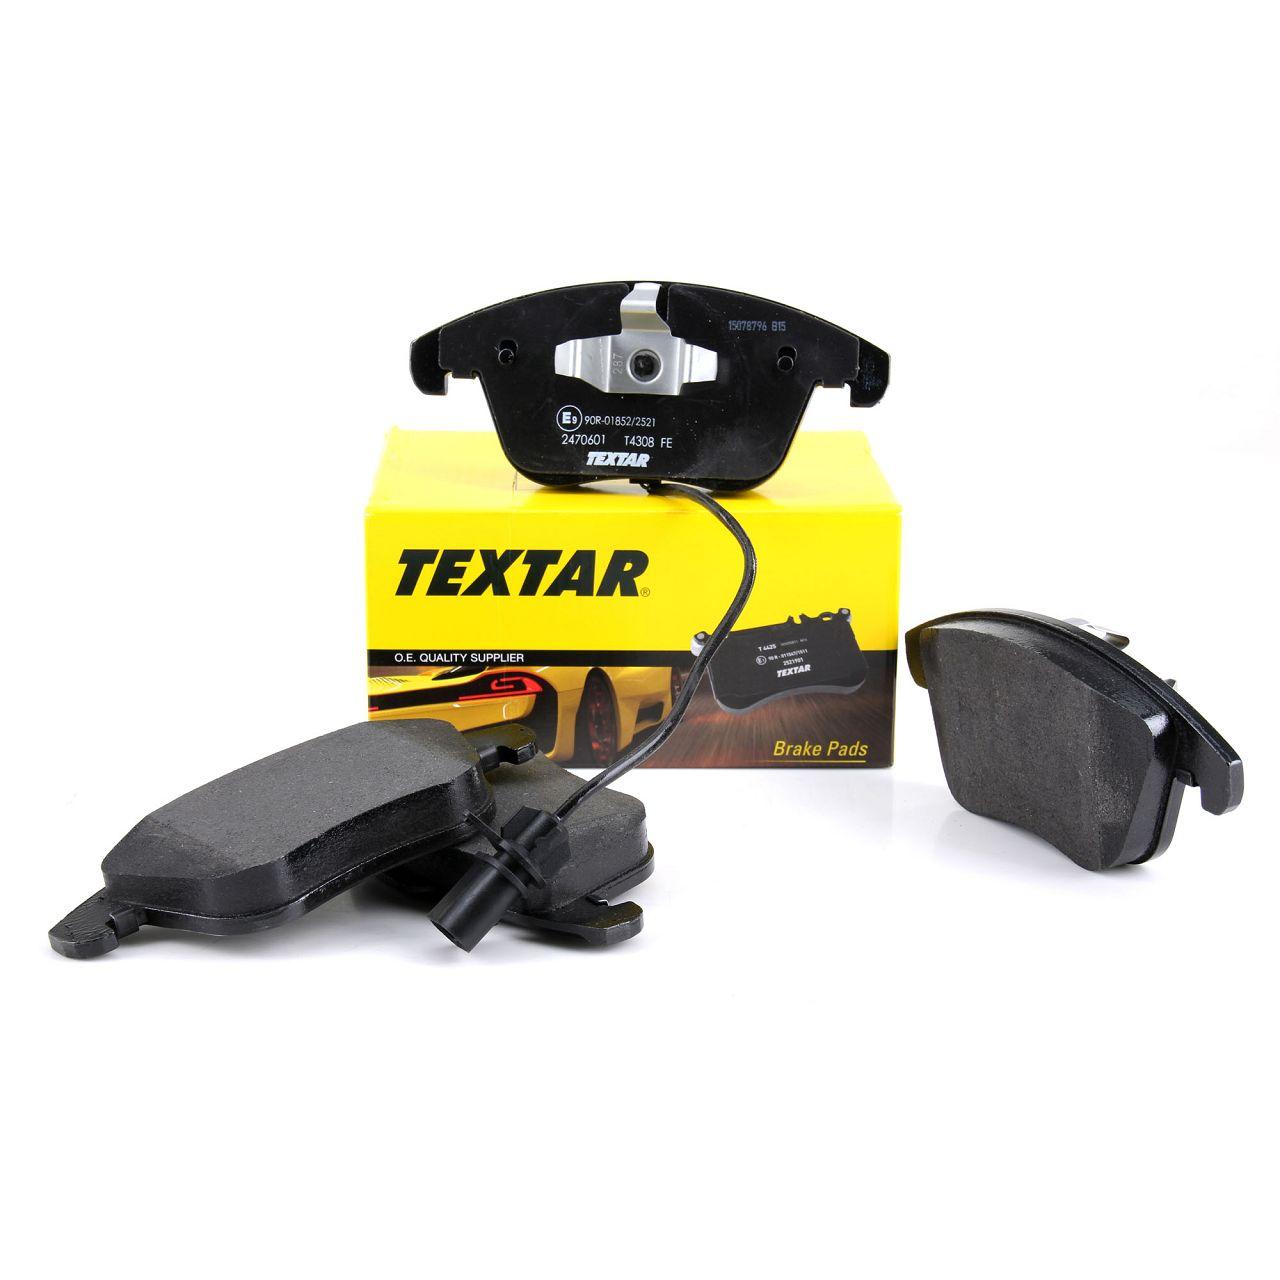 TEXTAR Bremsbeläge Bremsbelagsatz + Wako für Audi A4 (8K B8) A5 PR-1L/1LY vorne